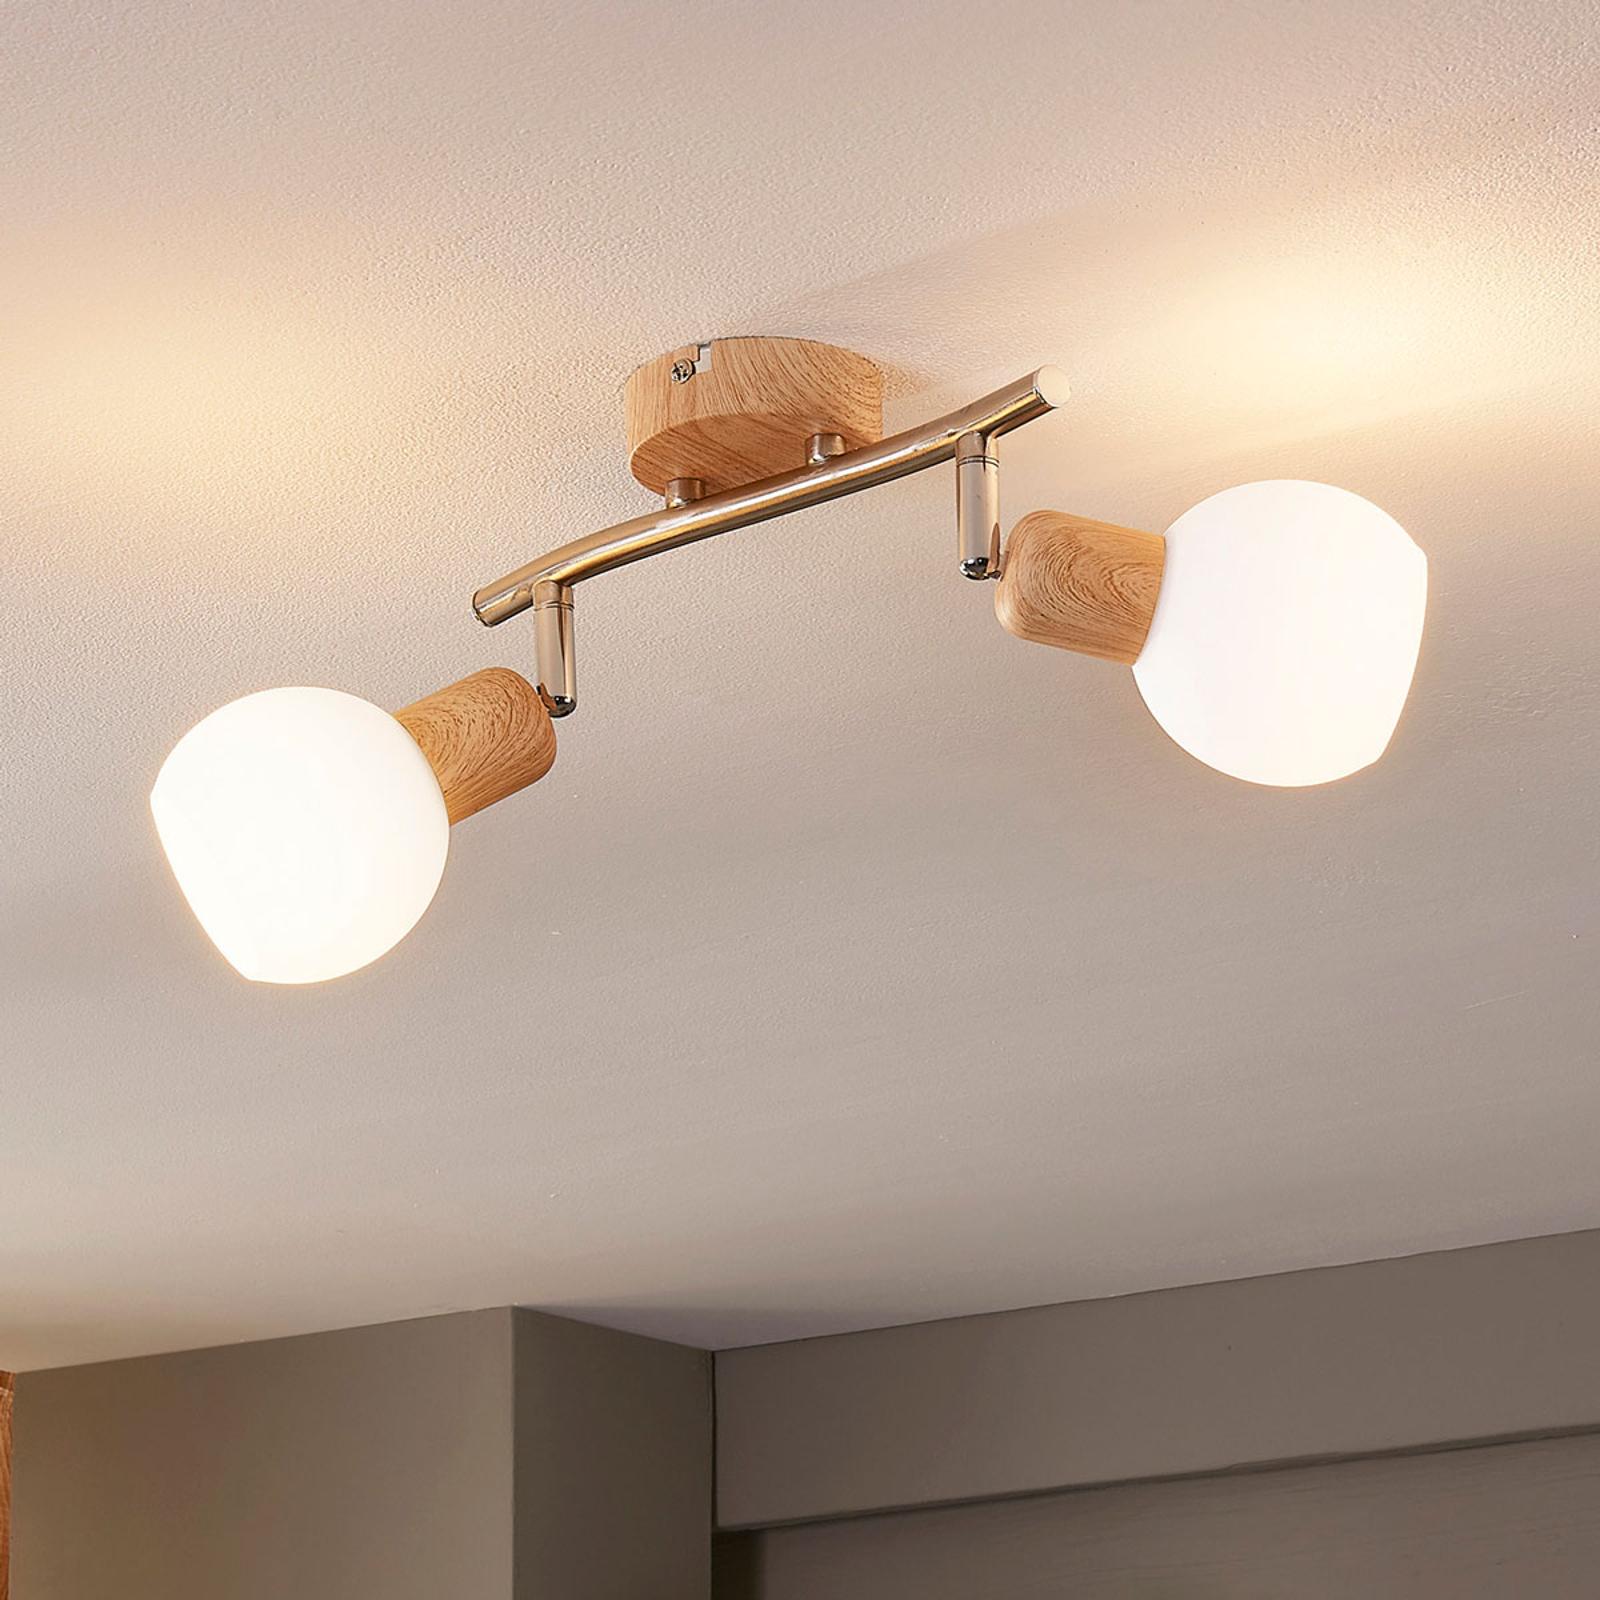 Spot LED en bois Svenka à 2 lampes